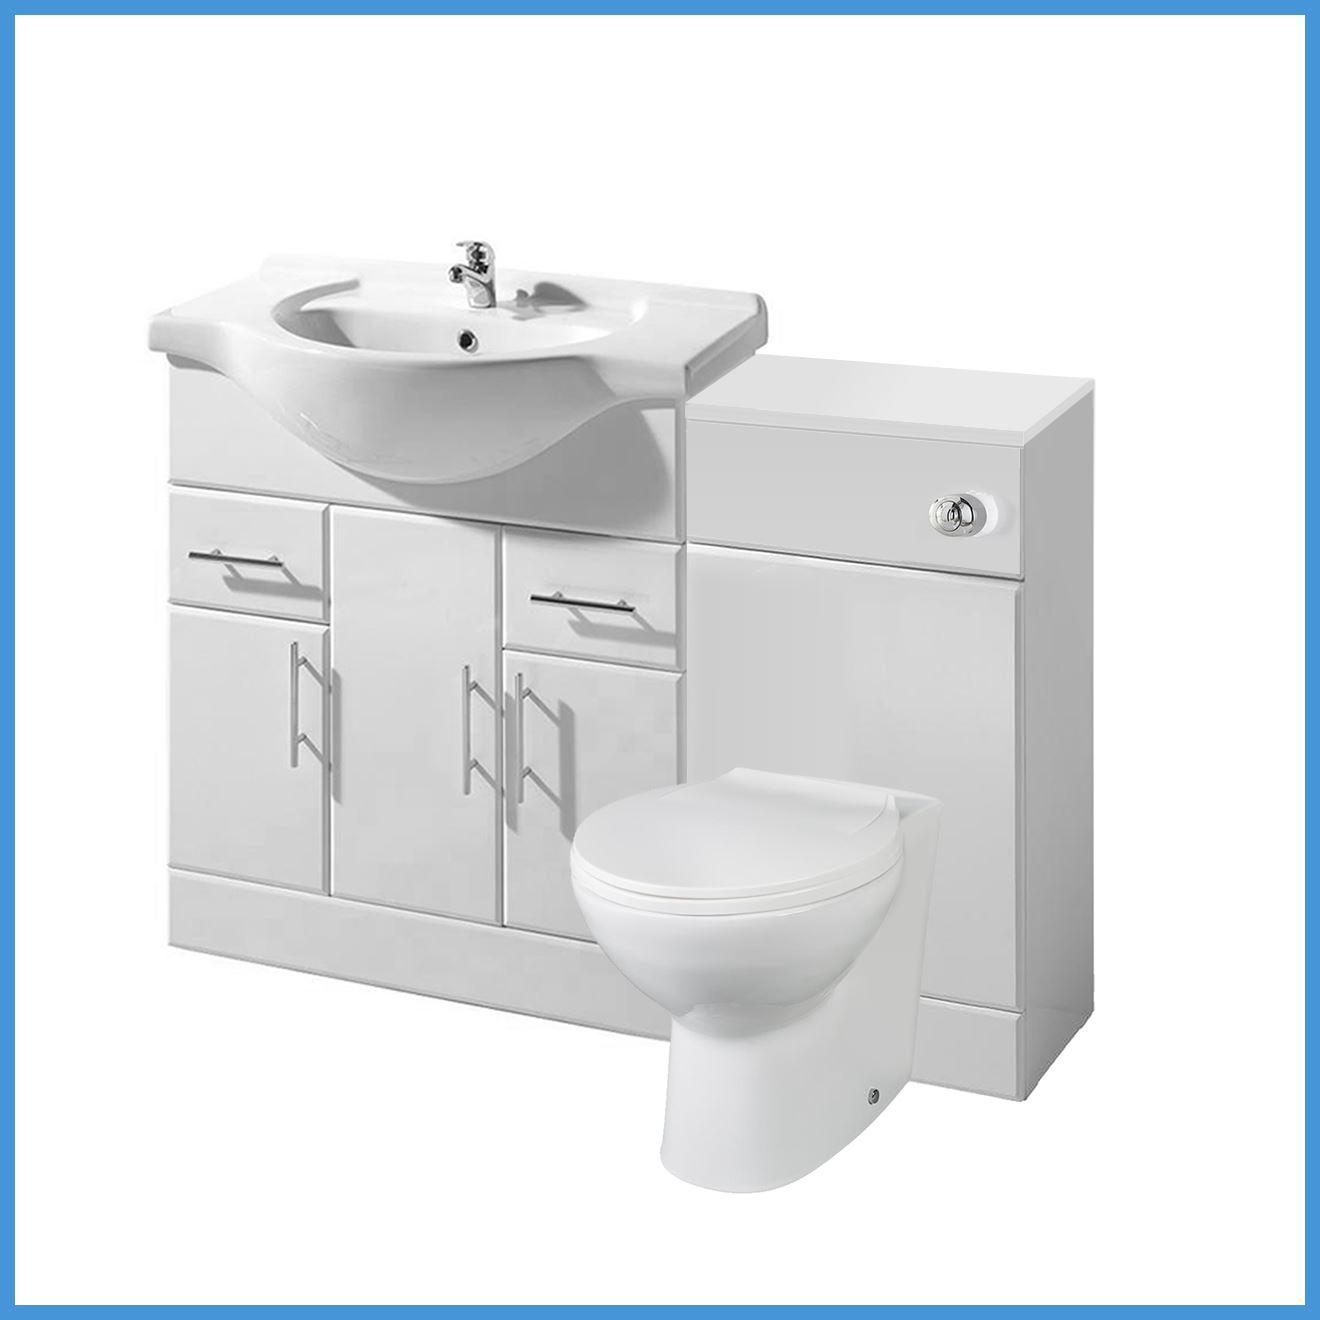 High gloss white bathroom vanity unit storage cabinet wc - High gloss bathroom cabinets white ...